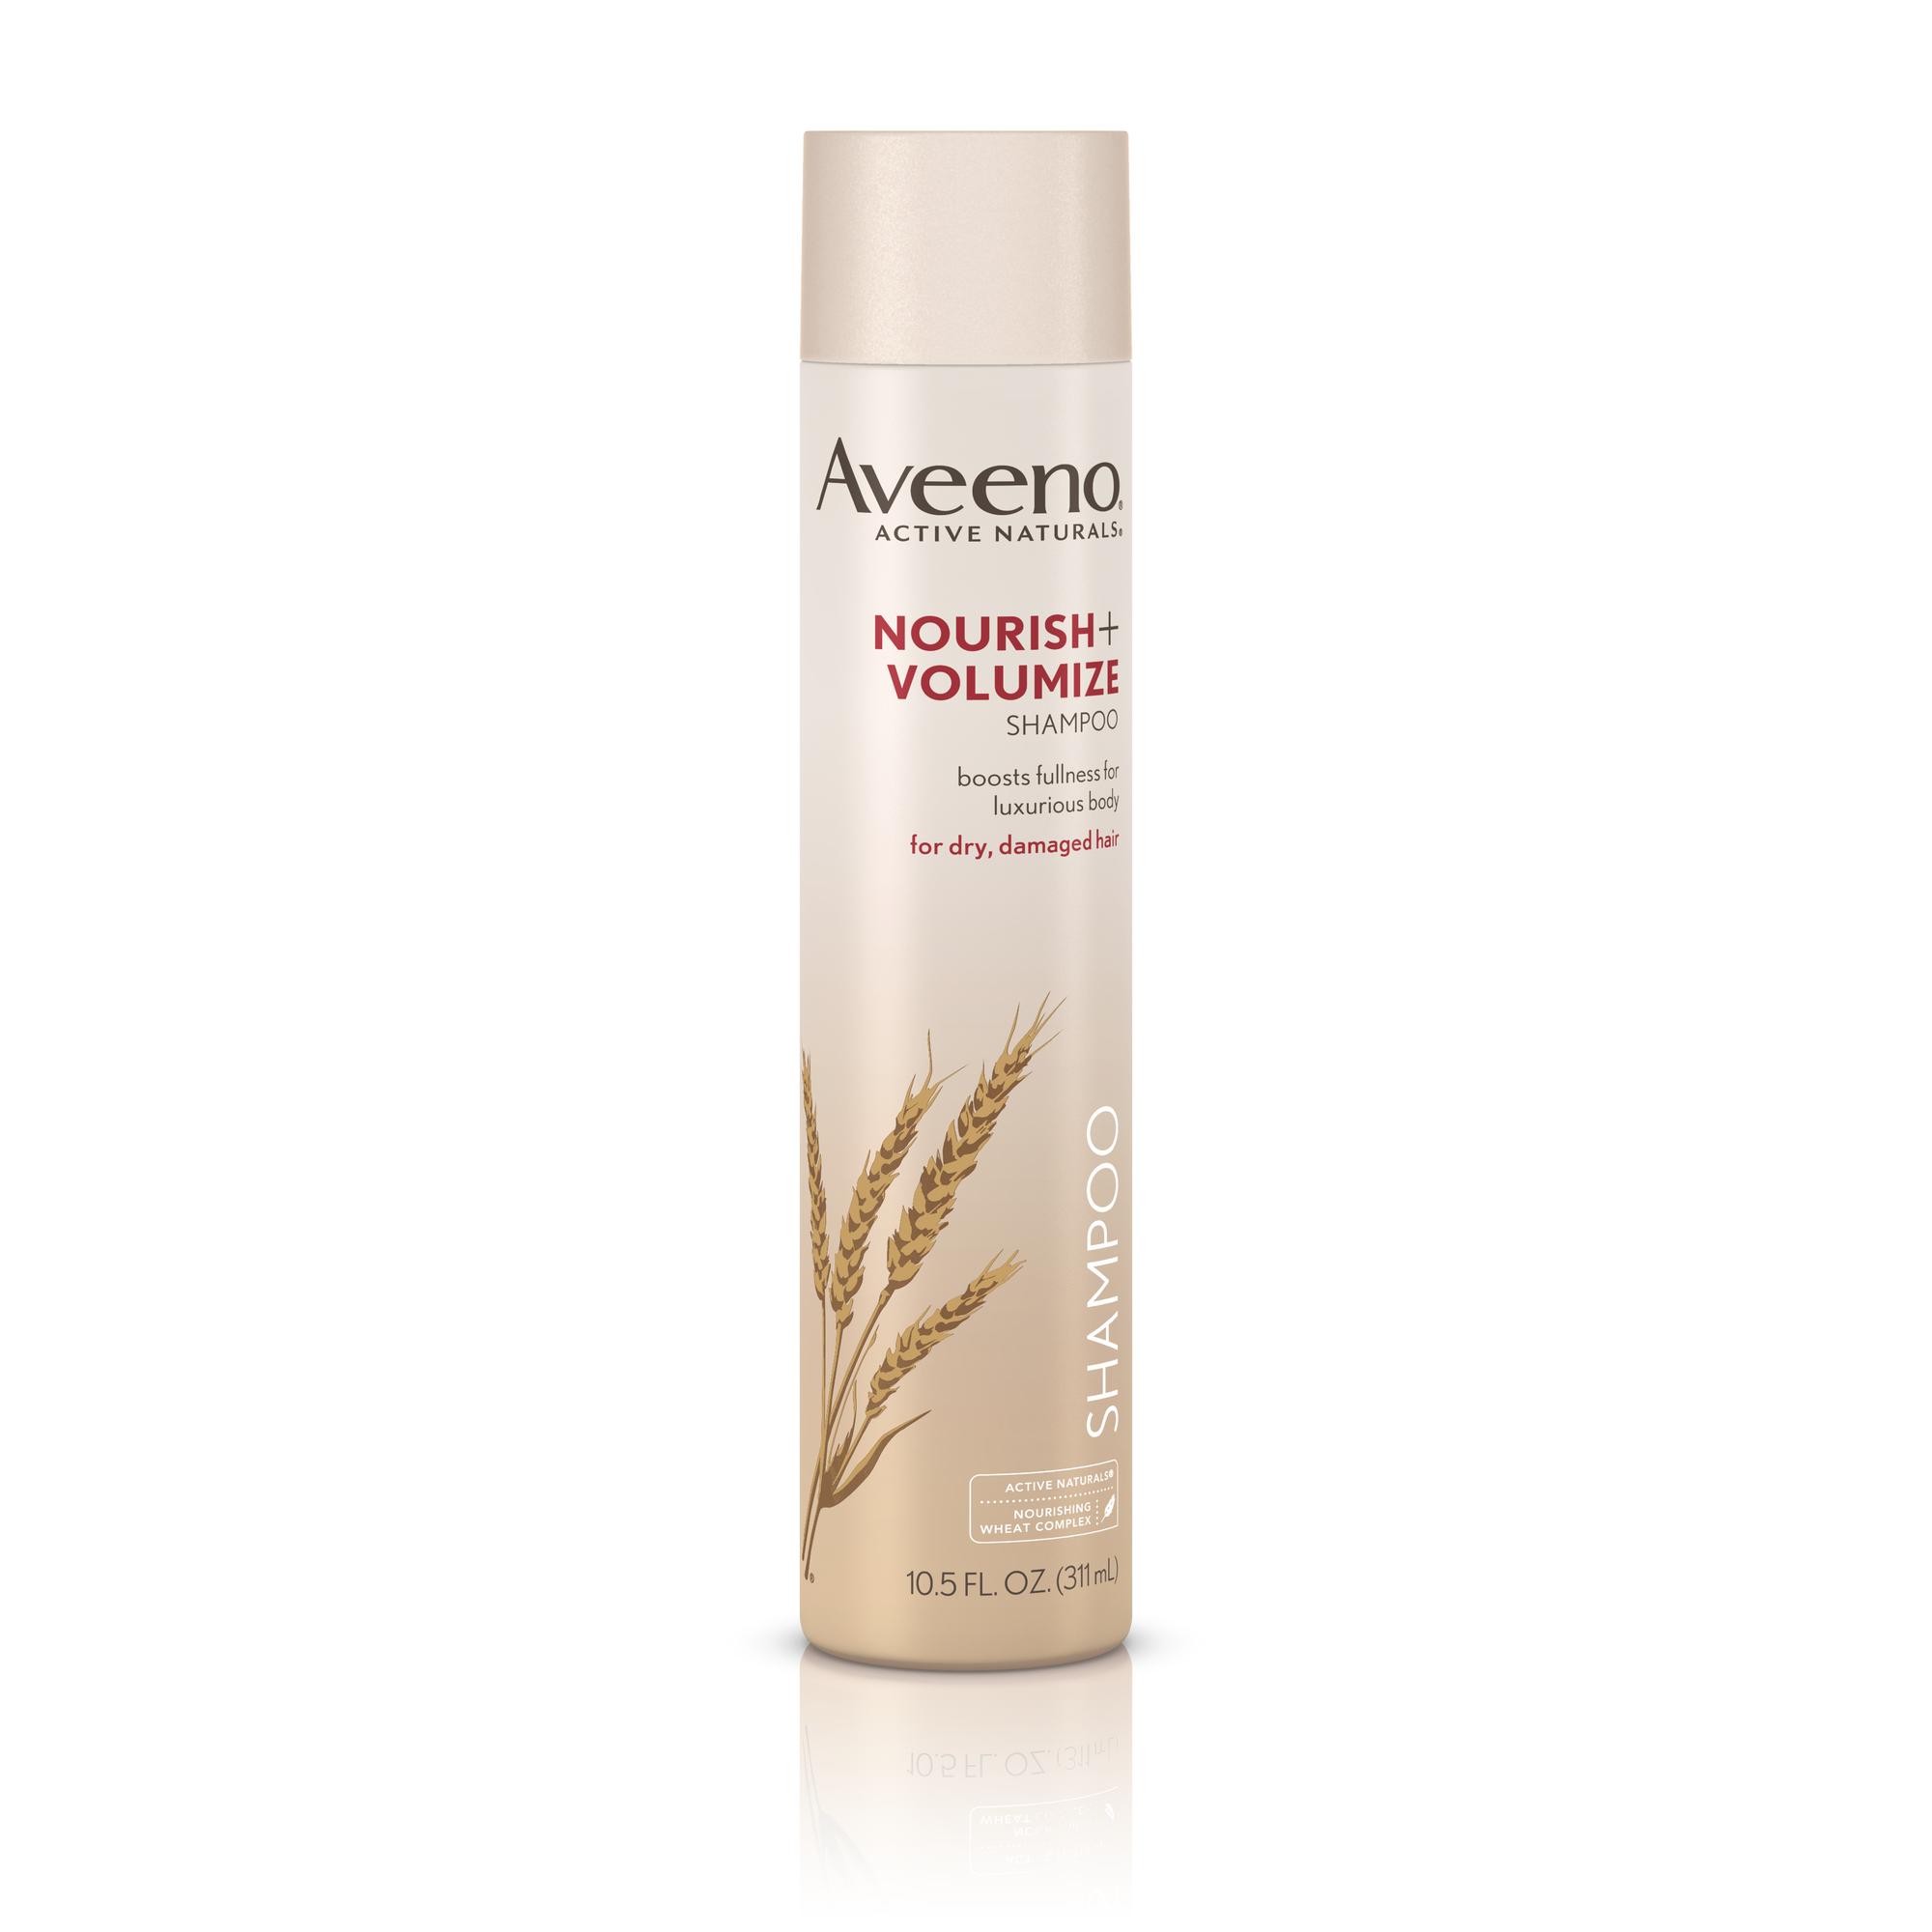 aveeno nourish volumize shampoo review